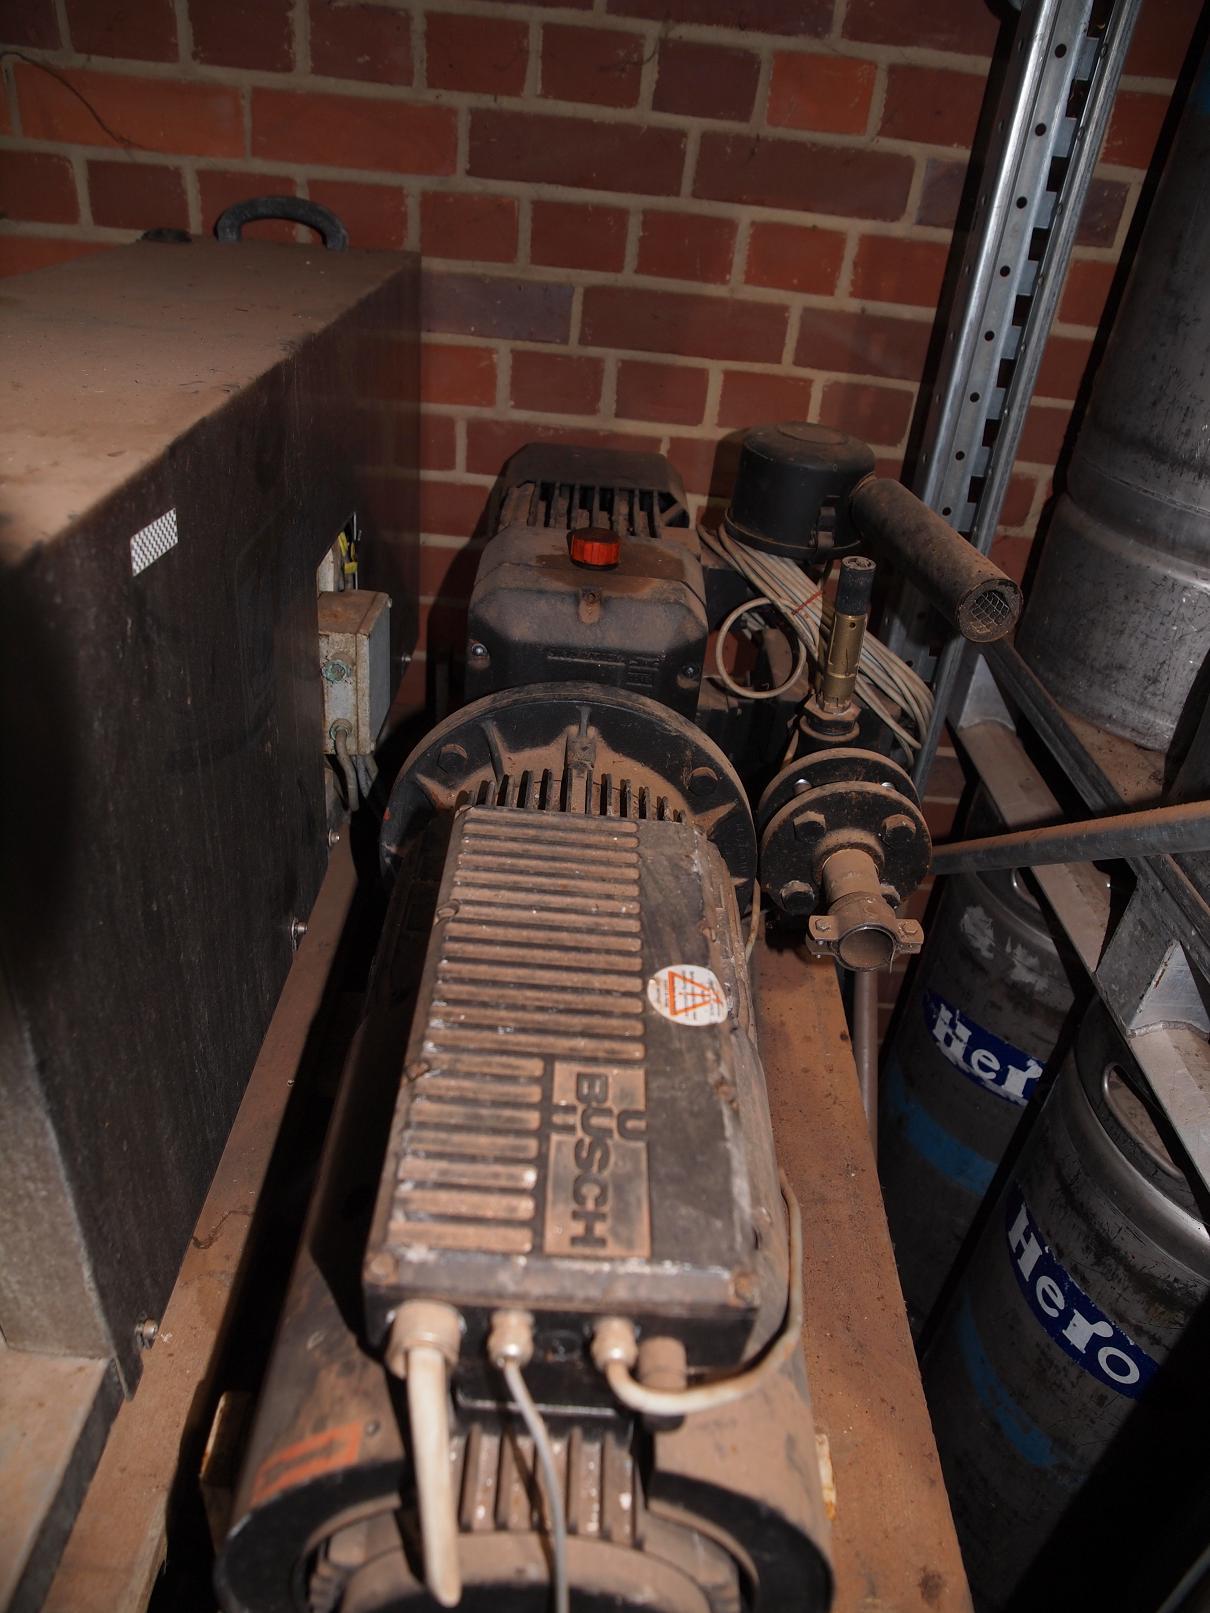 Mink-Trockene Klauen-Vakuumpumpe